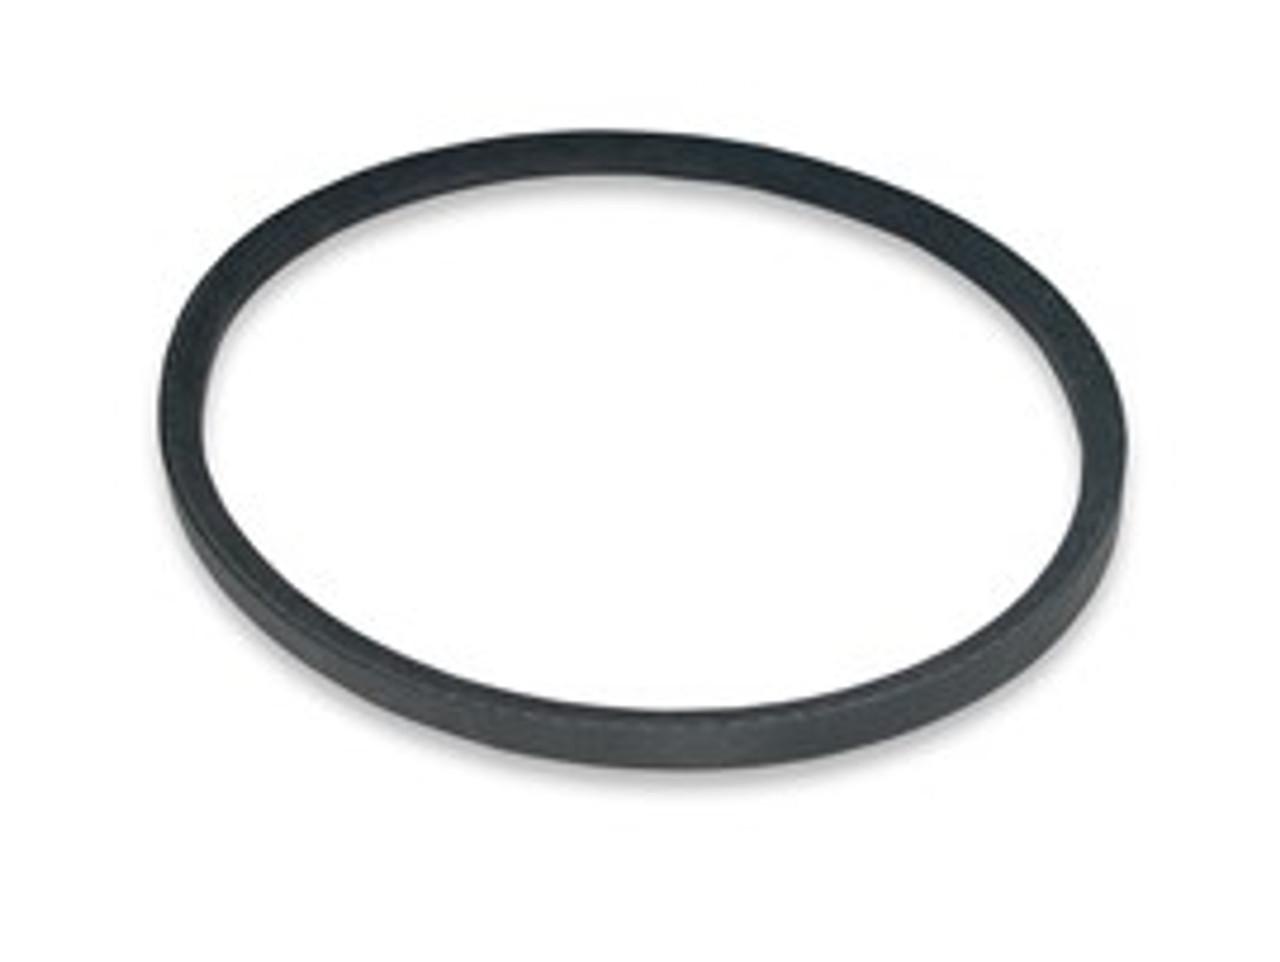 Hoover Conquest/Advantage V Belt #38528013